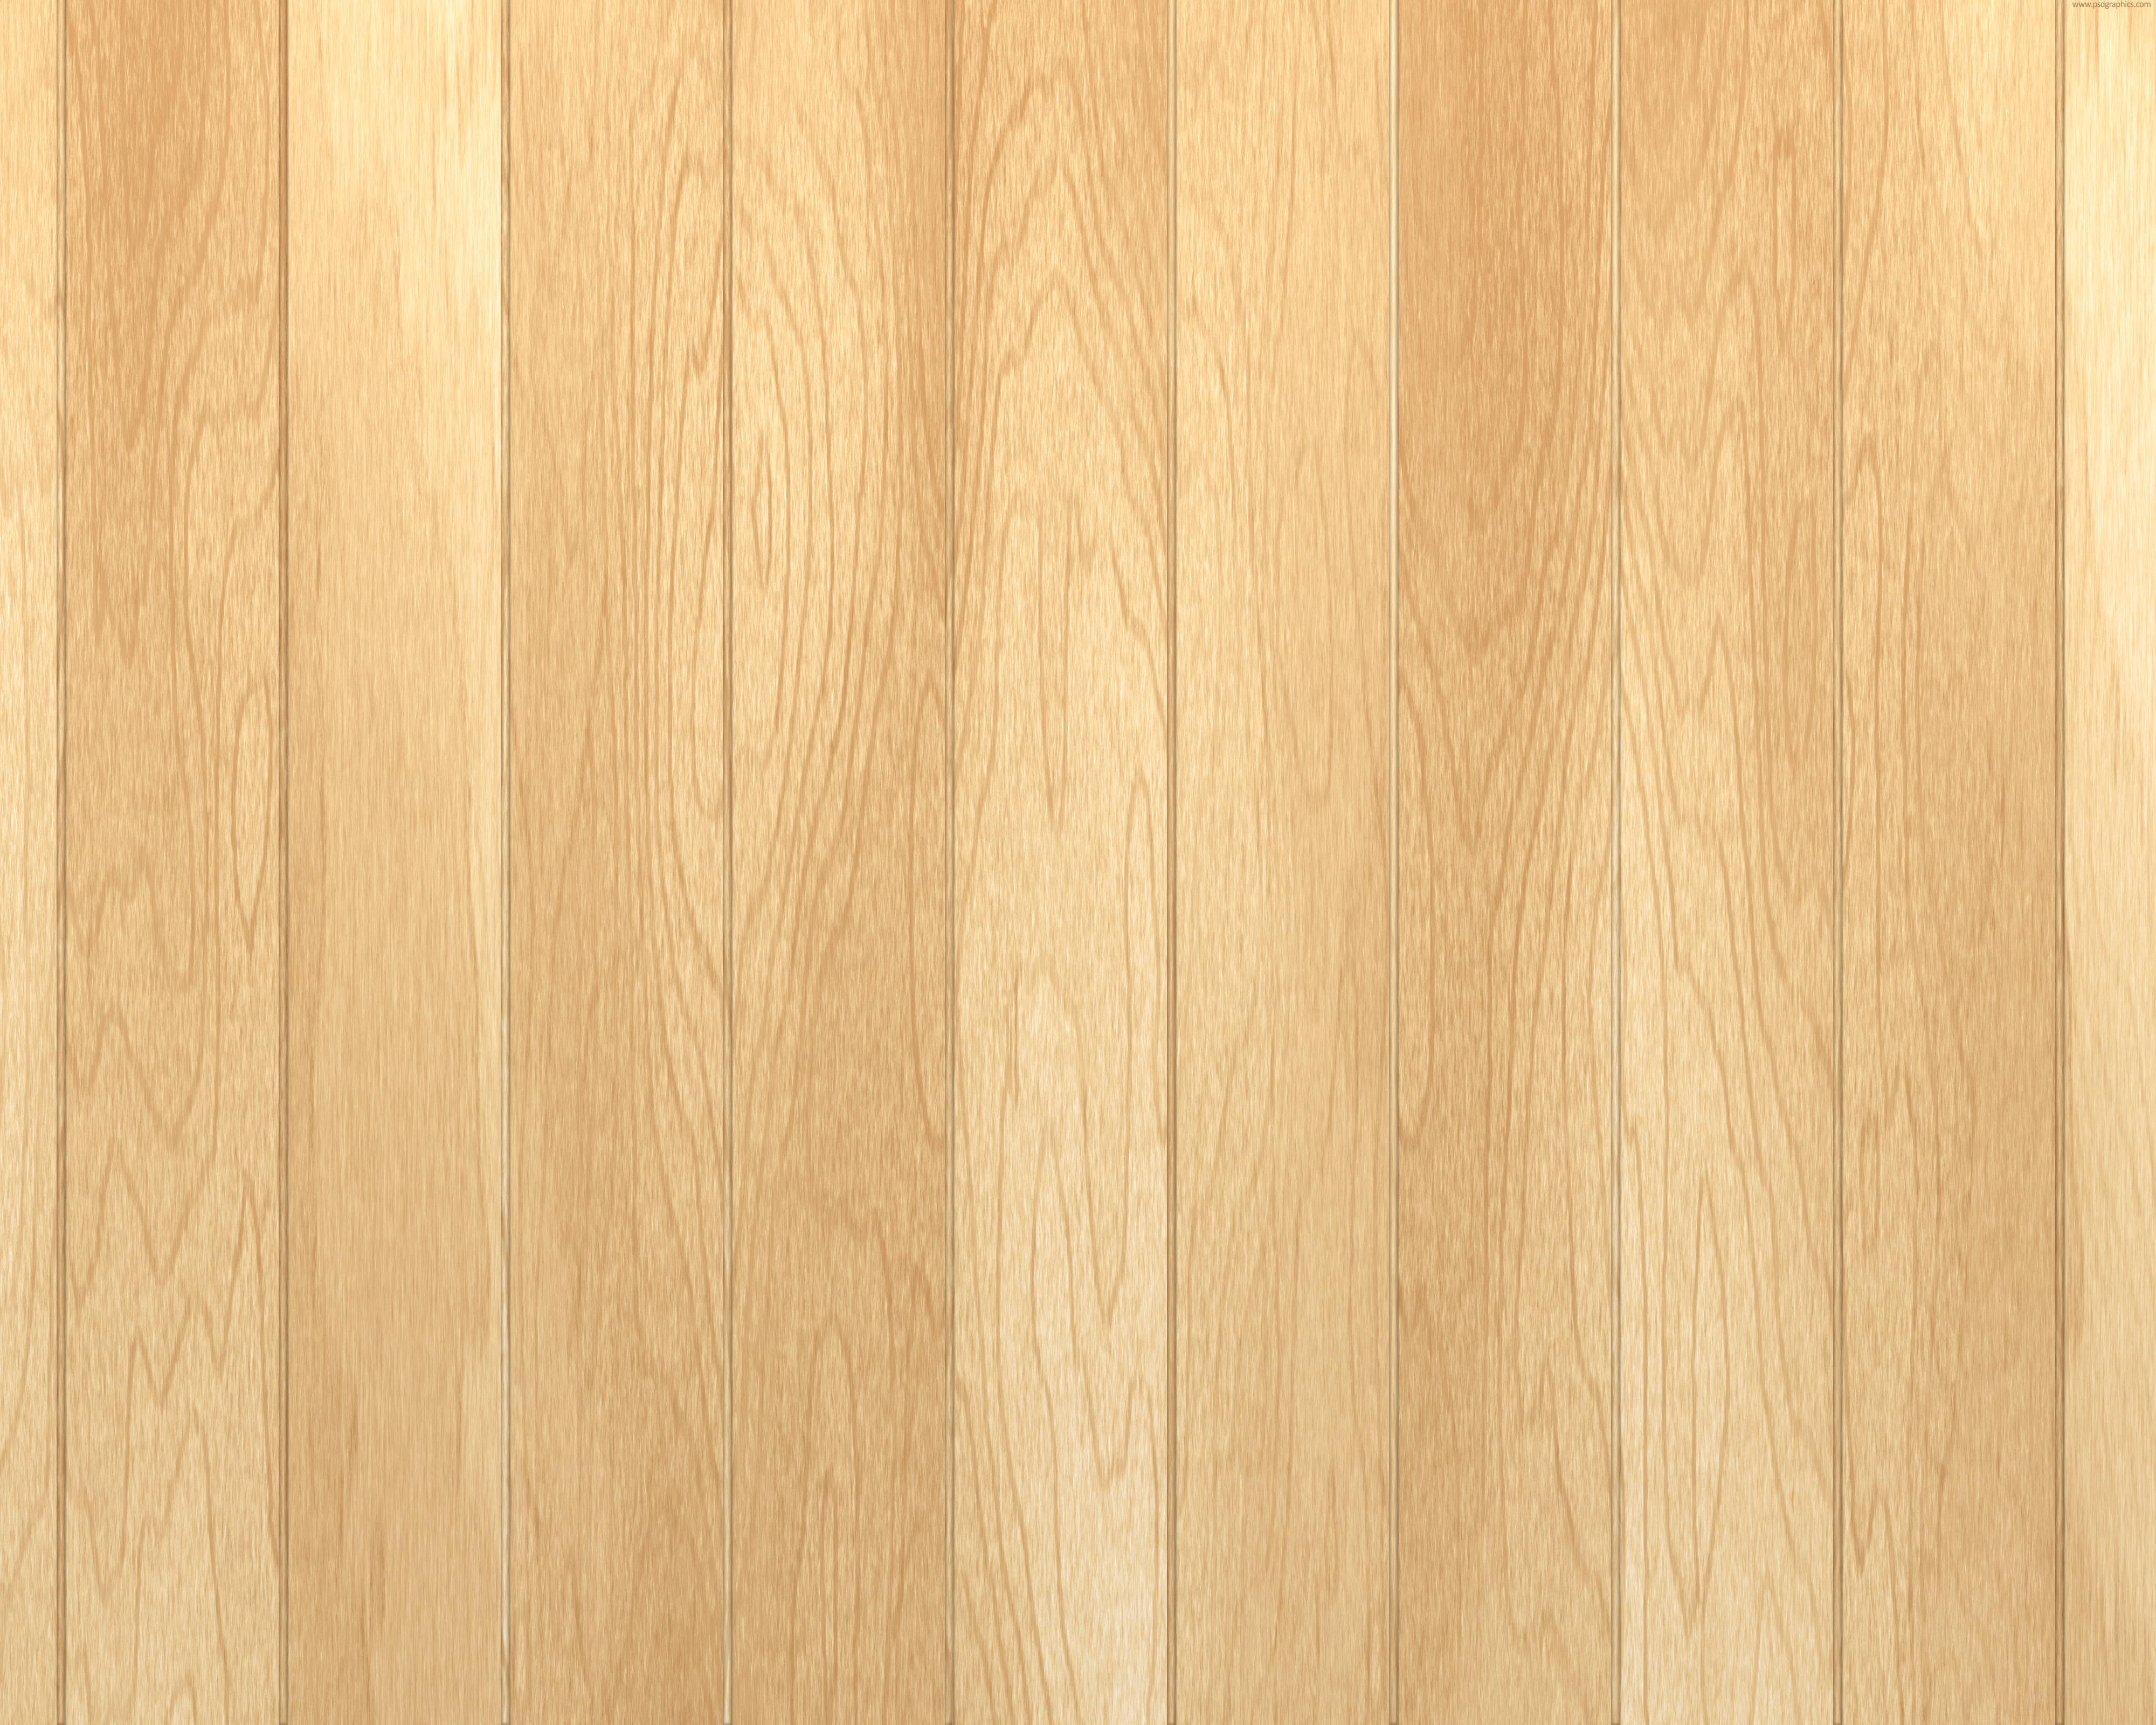 Wooden Panels Texture Psdgraphics